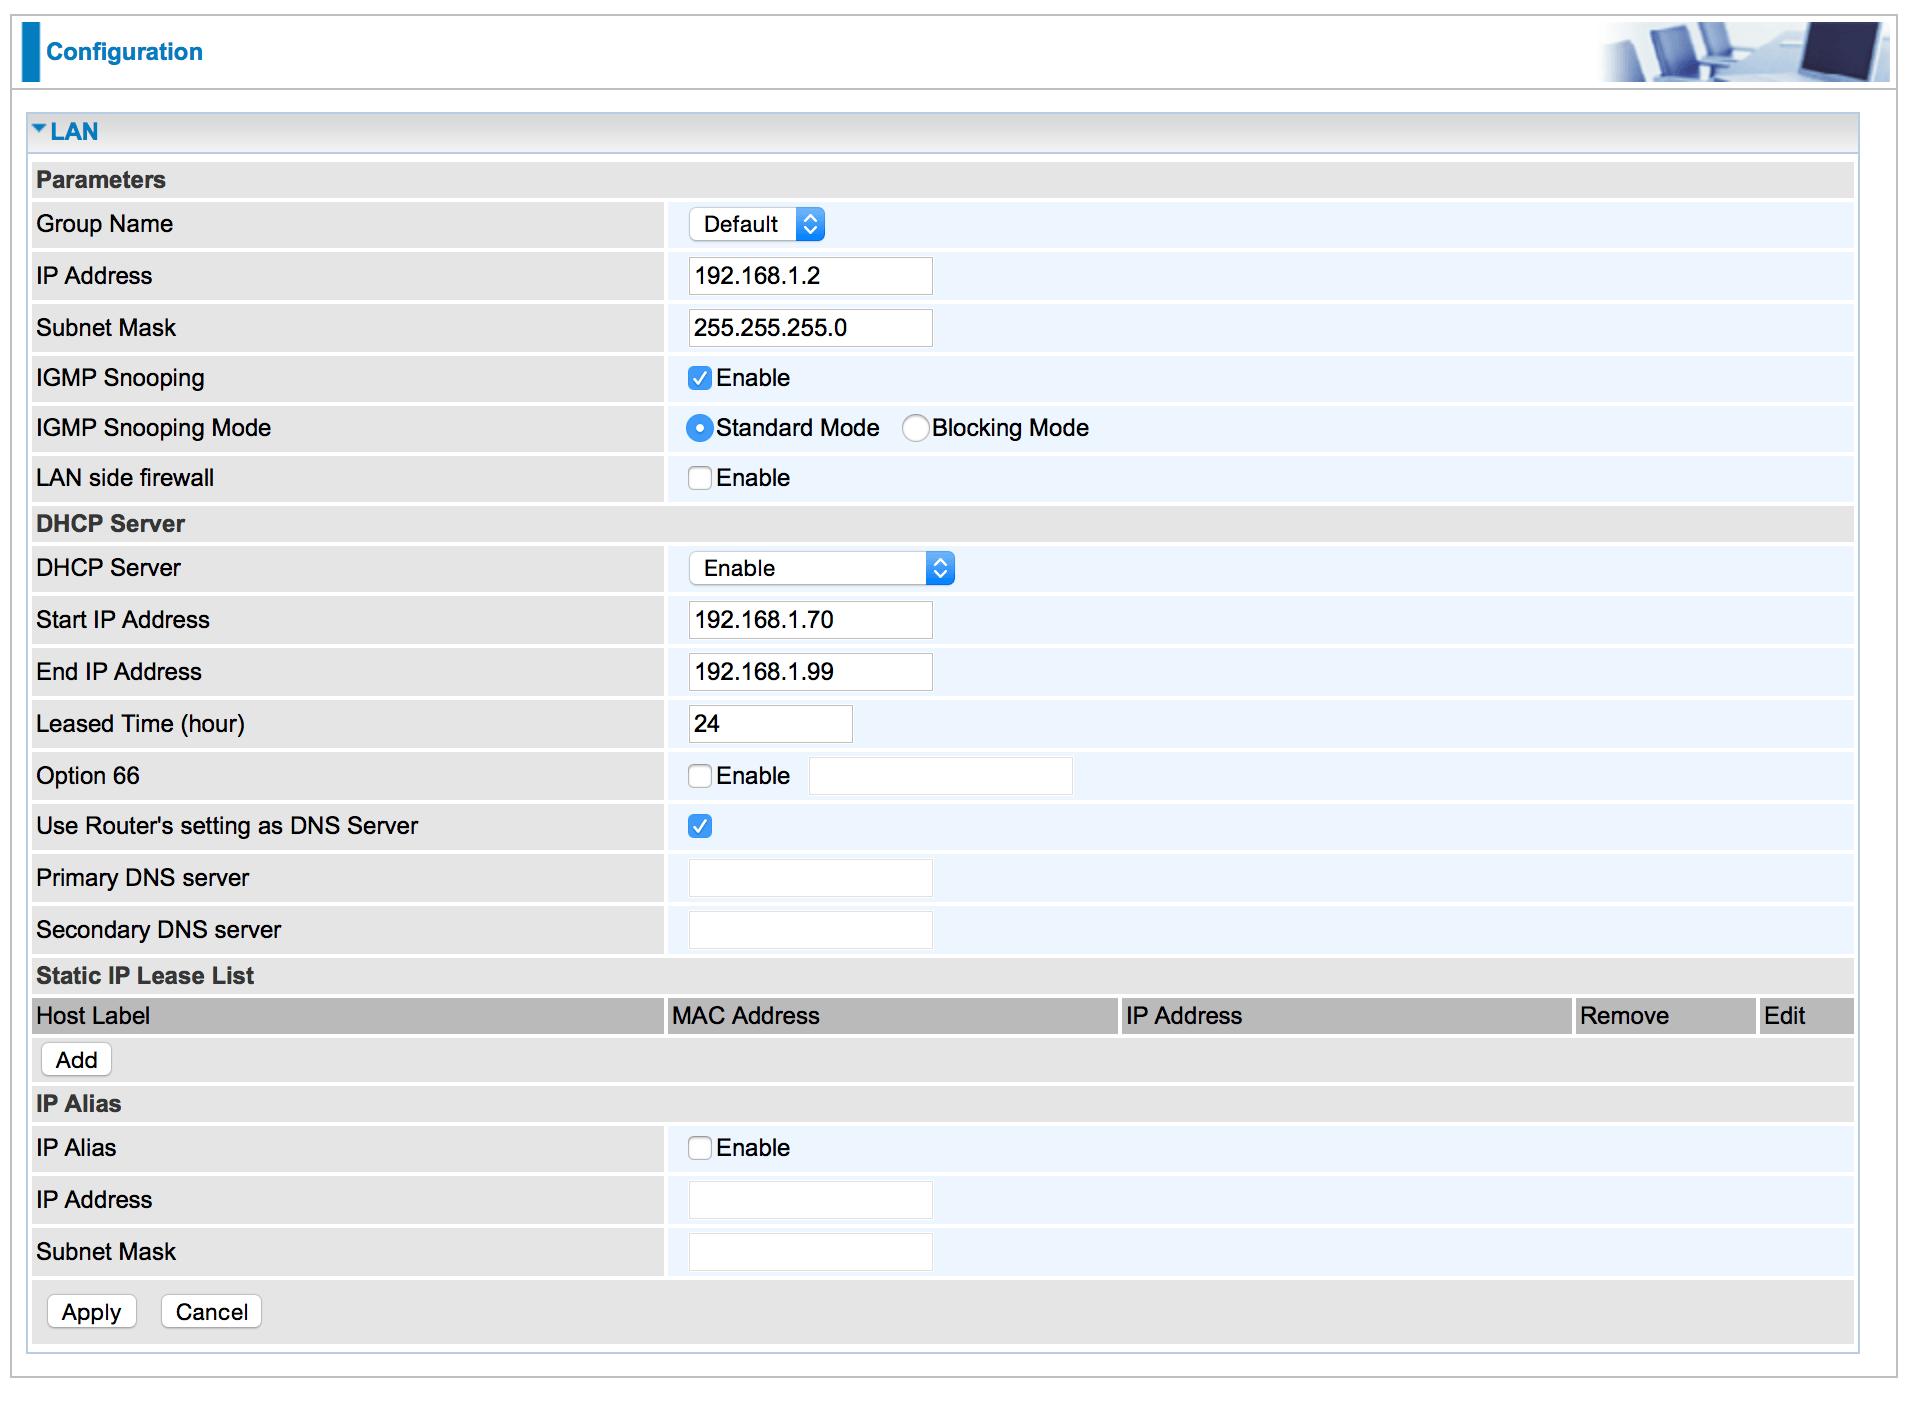 IGMP snooping mode